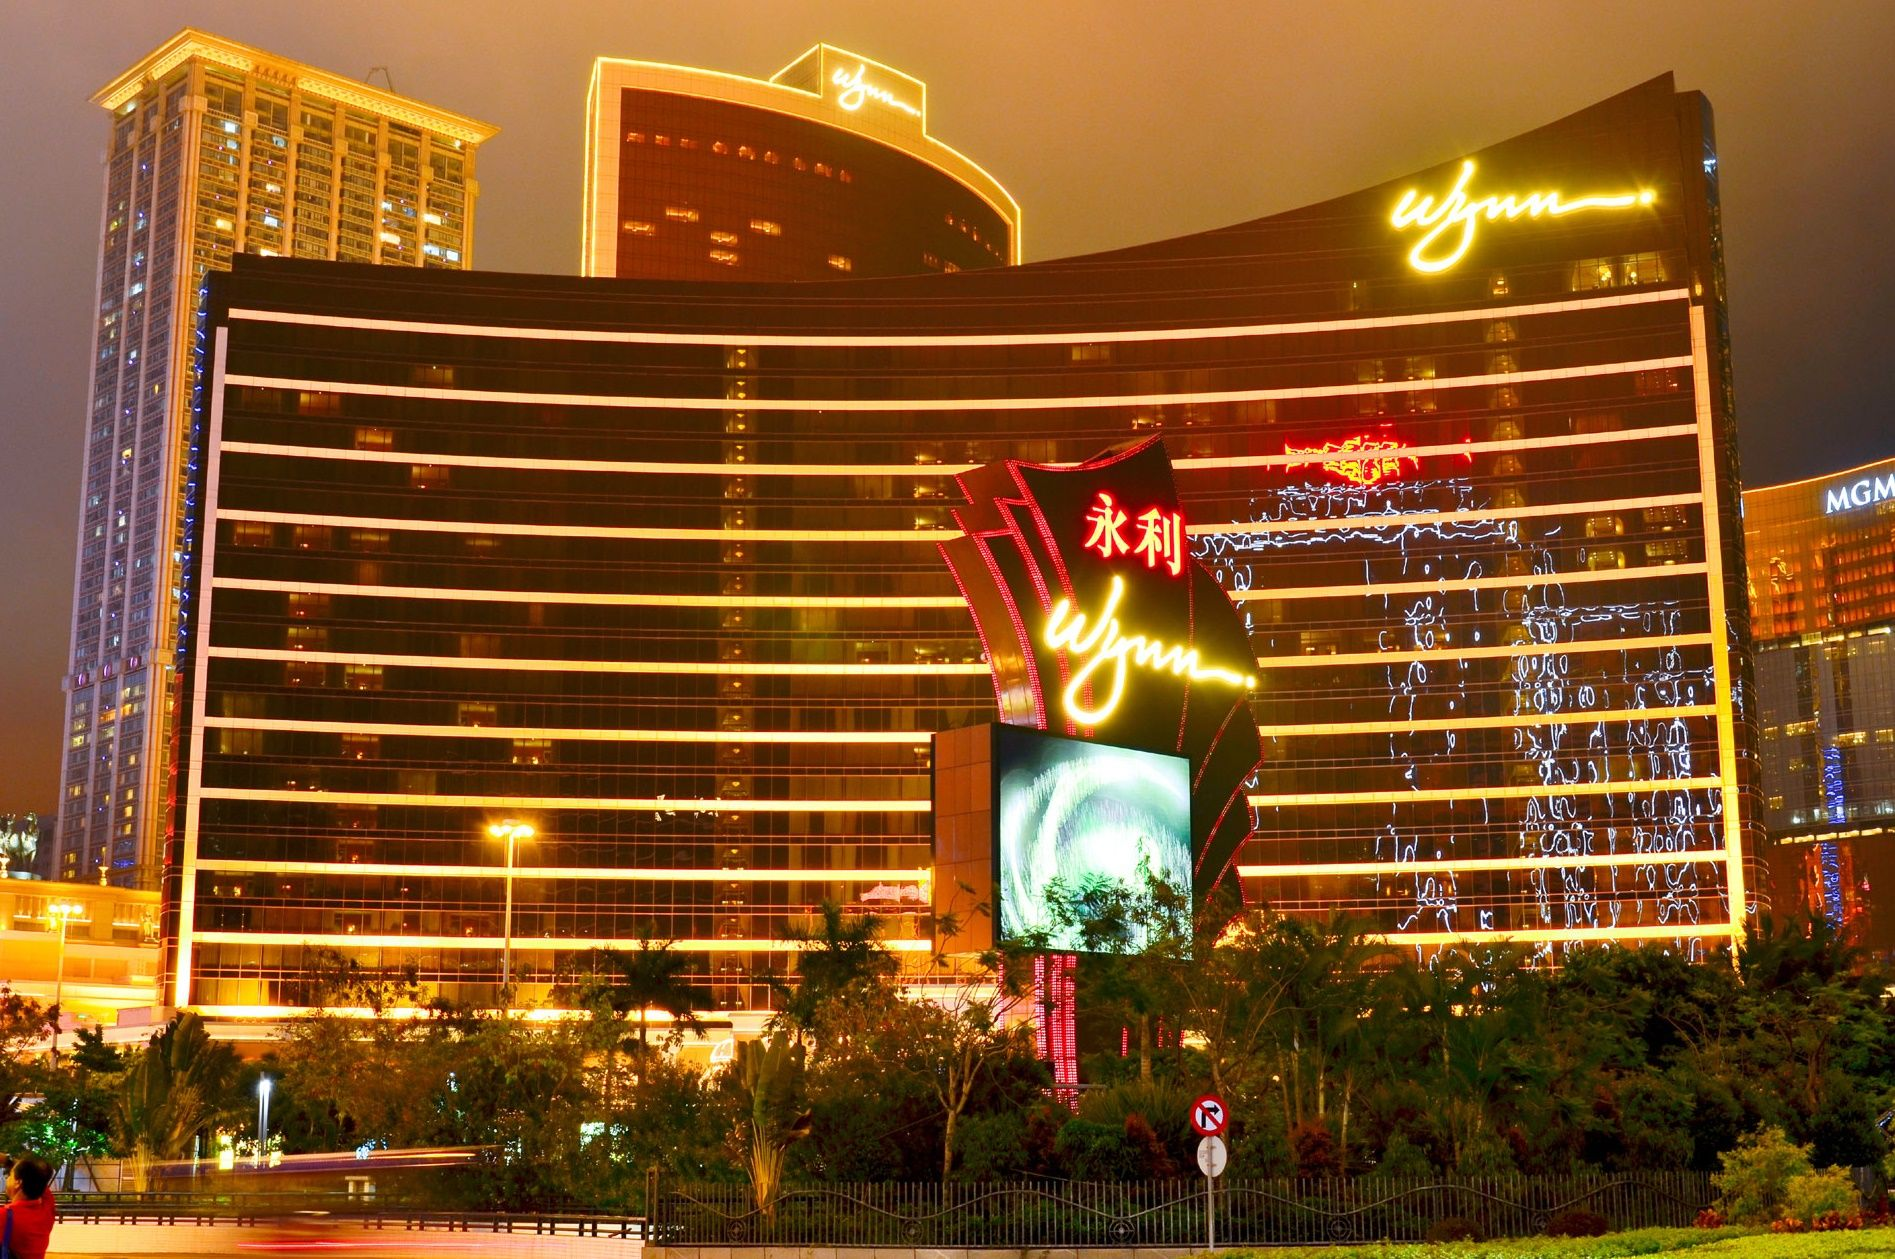 Wynn Resort And Casino